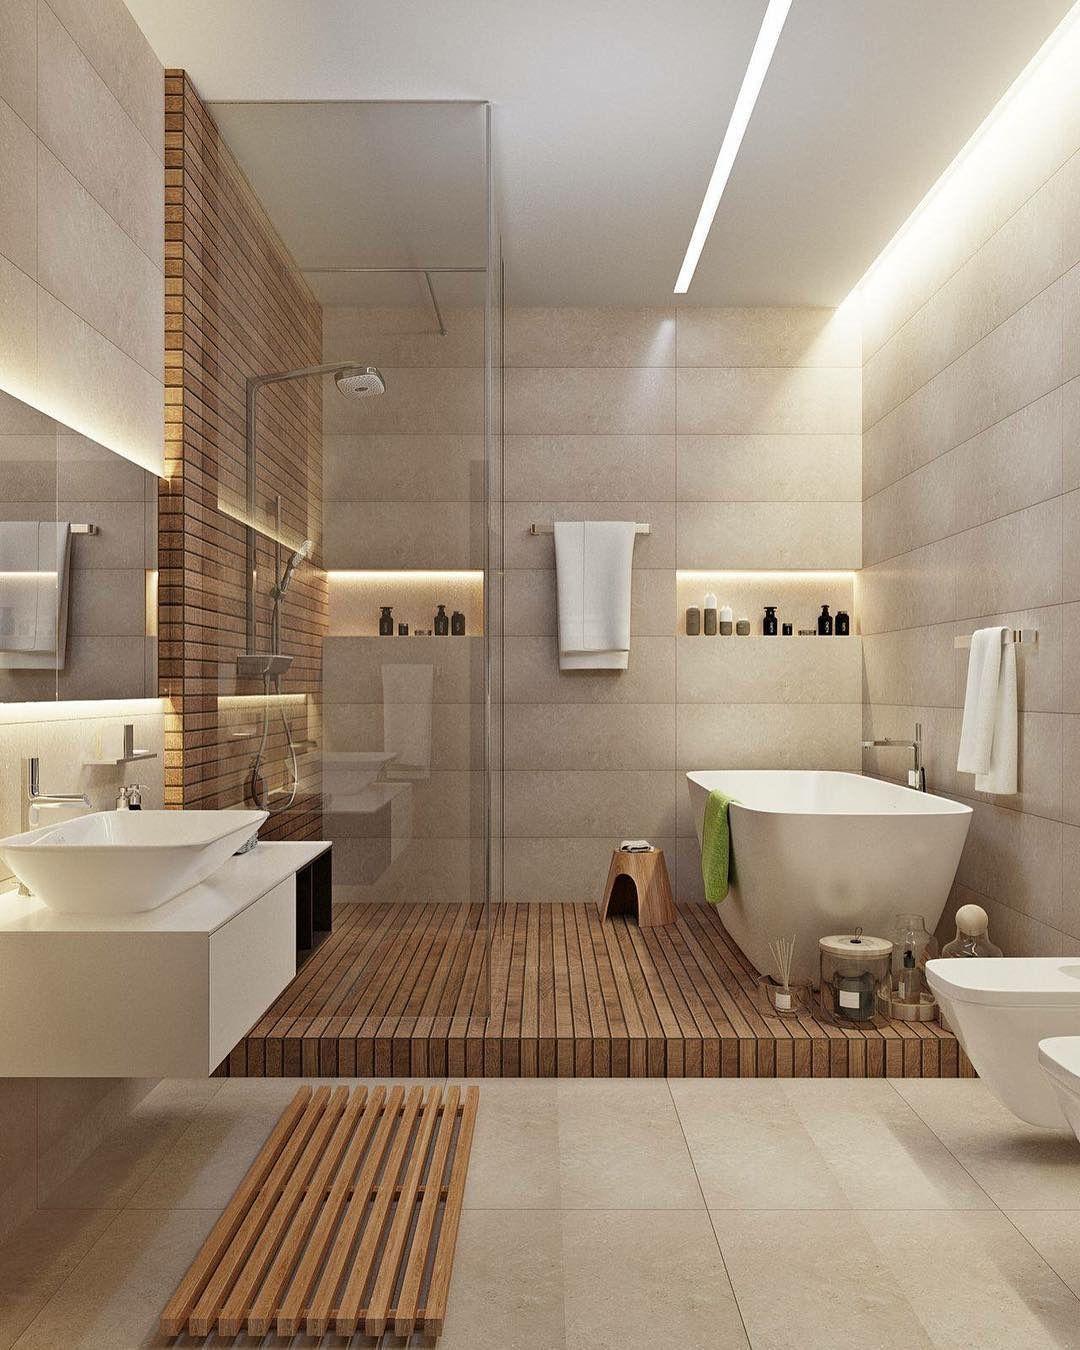 natural bathroom design ideas i have no money bathroom rh pinterest com modern natural bathroom designs natural looking bathroom designs